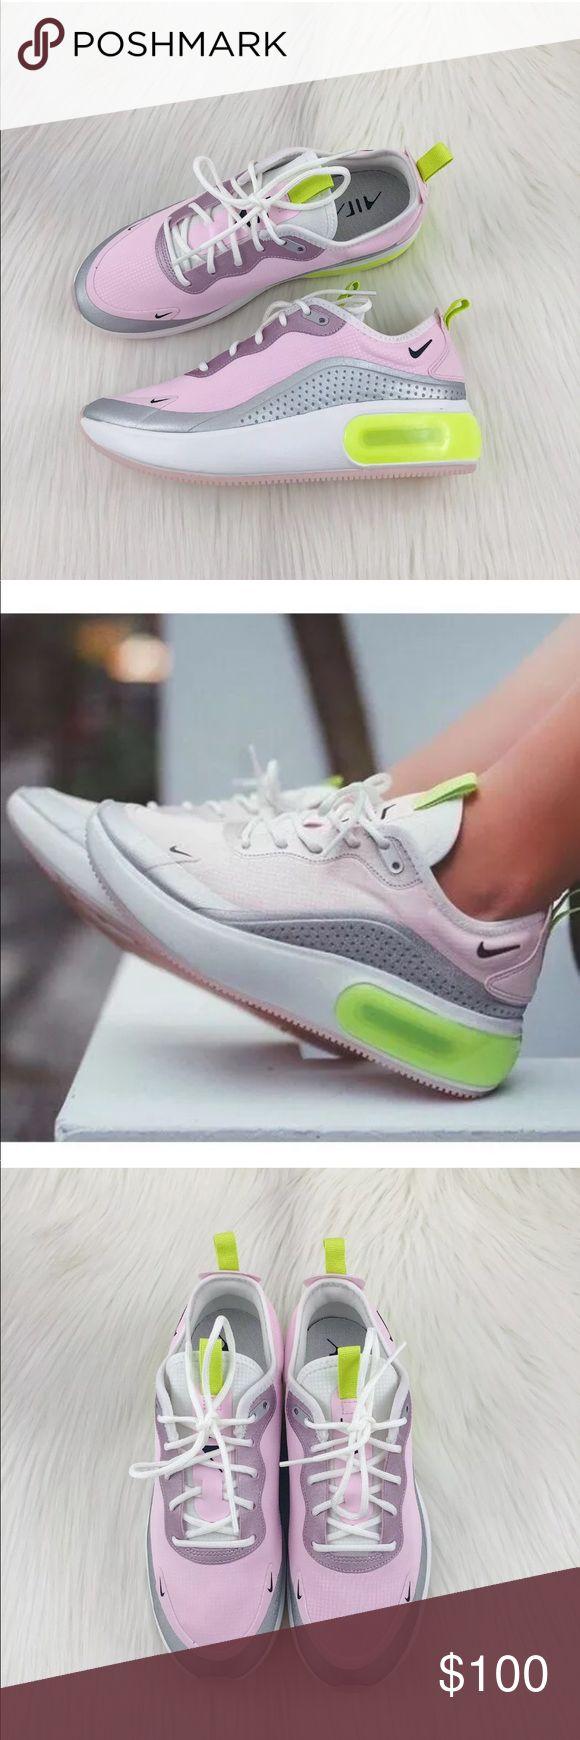 Women's Nike Air Max Dia Pink Foam Sneakers Women's Nike